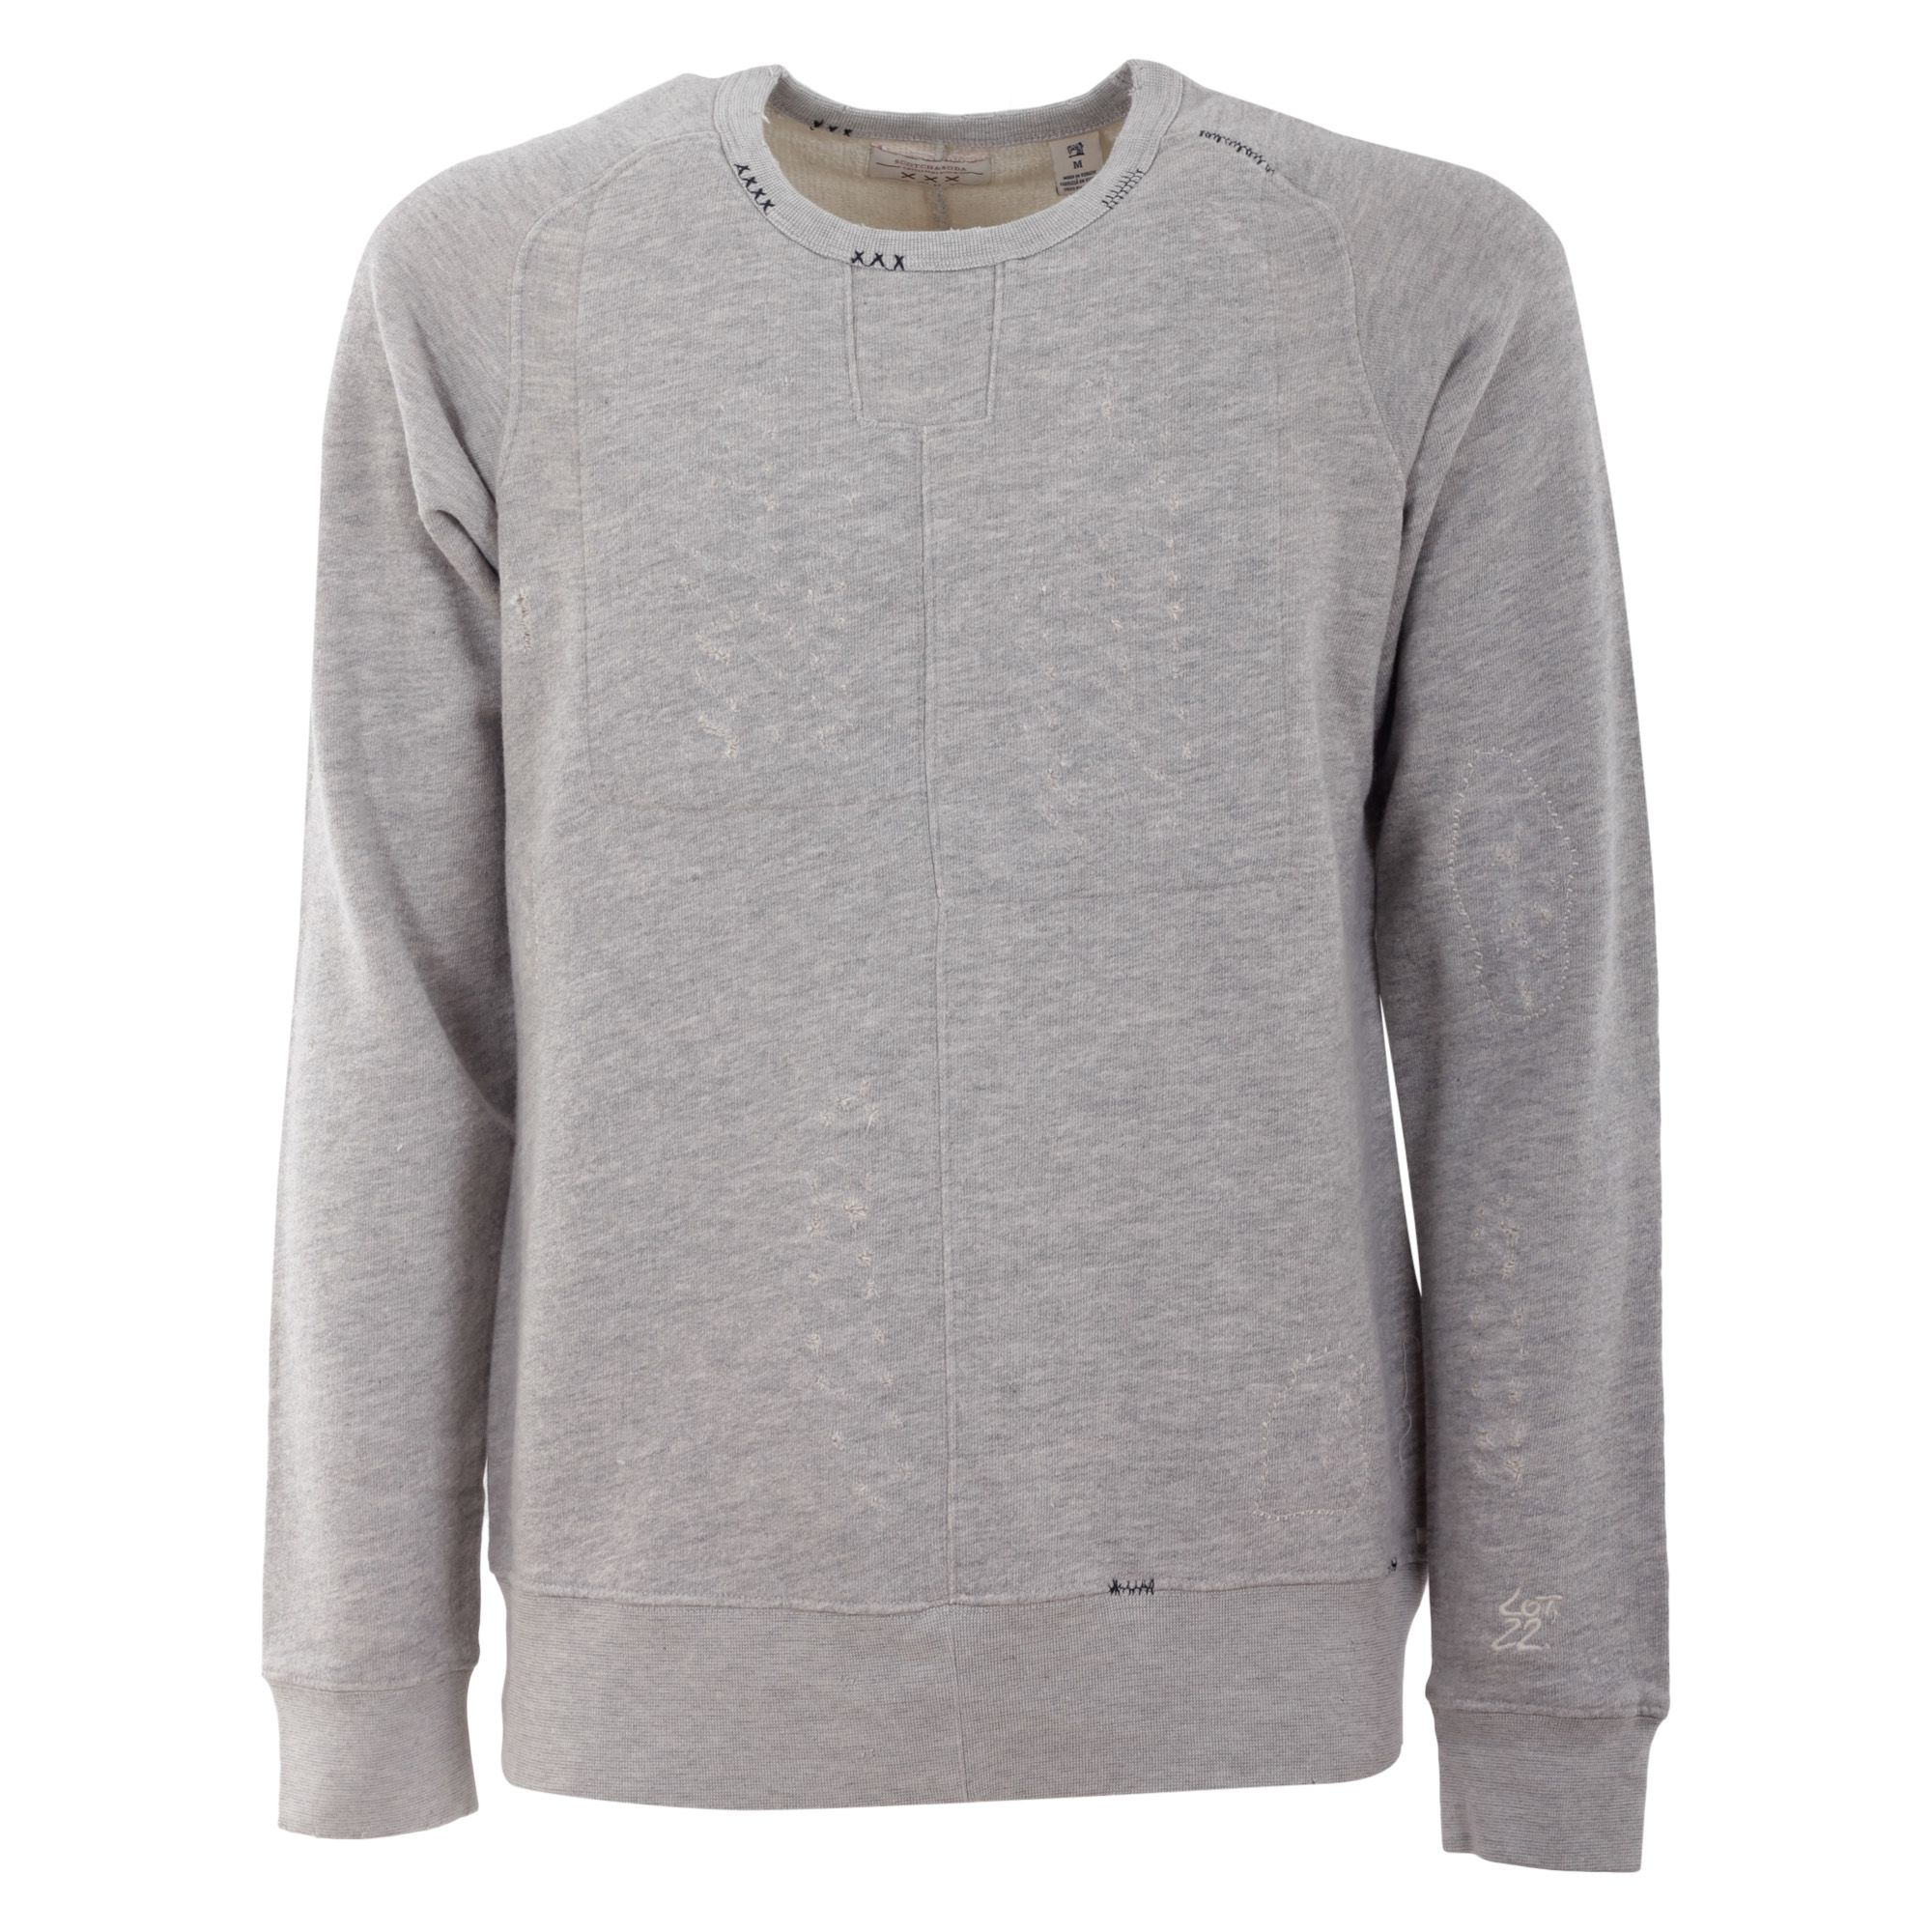 Scotch & soda Cotton Sweatshirt